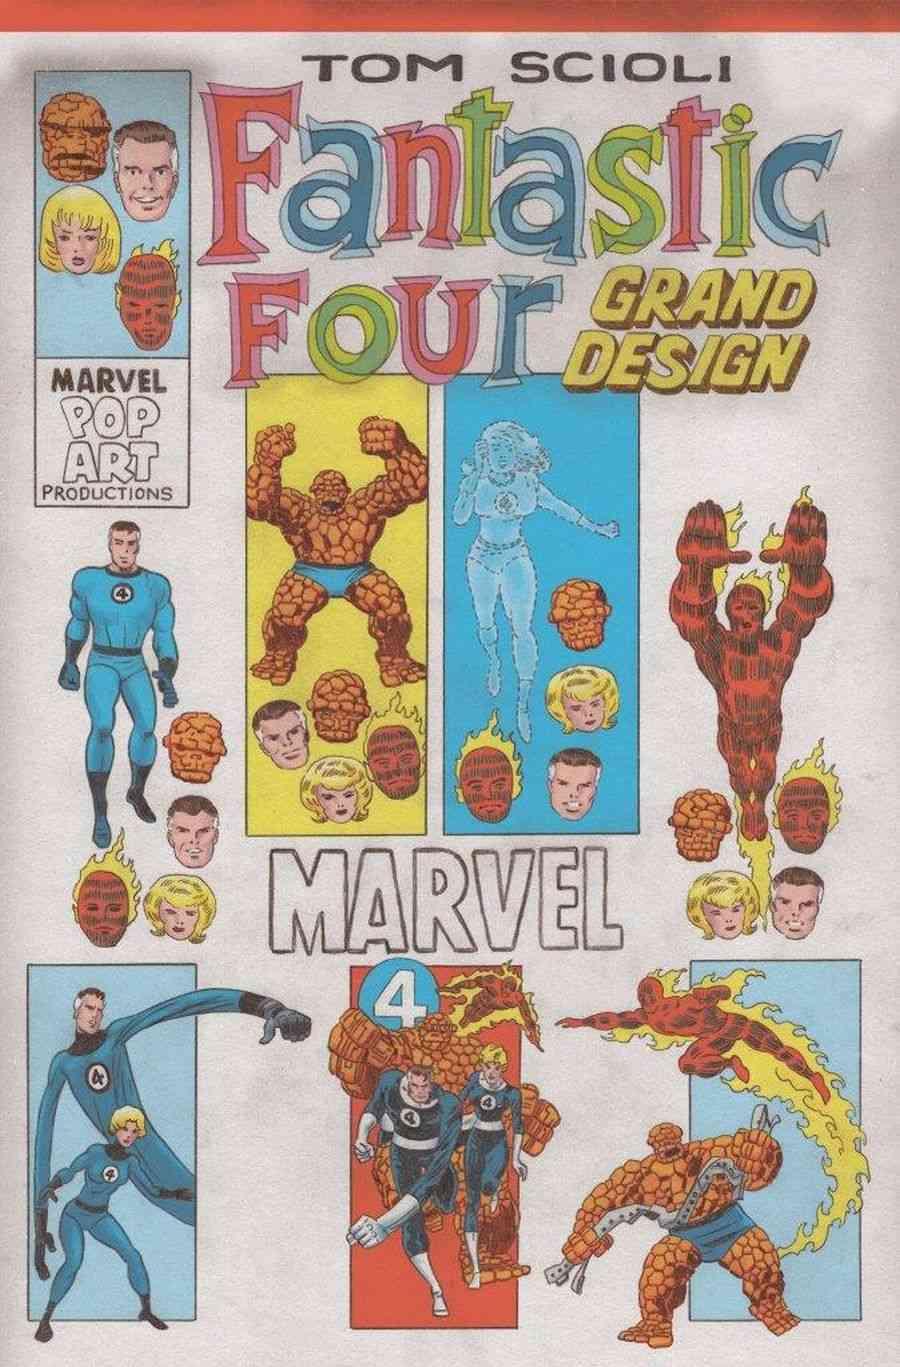 Fantastic Four: Grand Design #1, variant cover di Tom Scioli